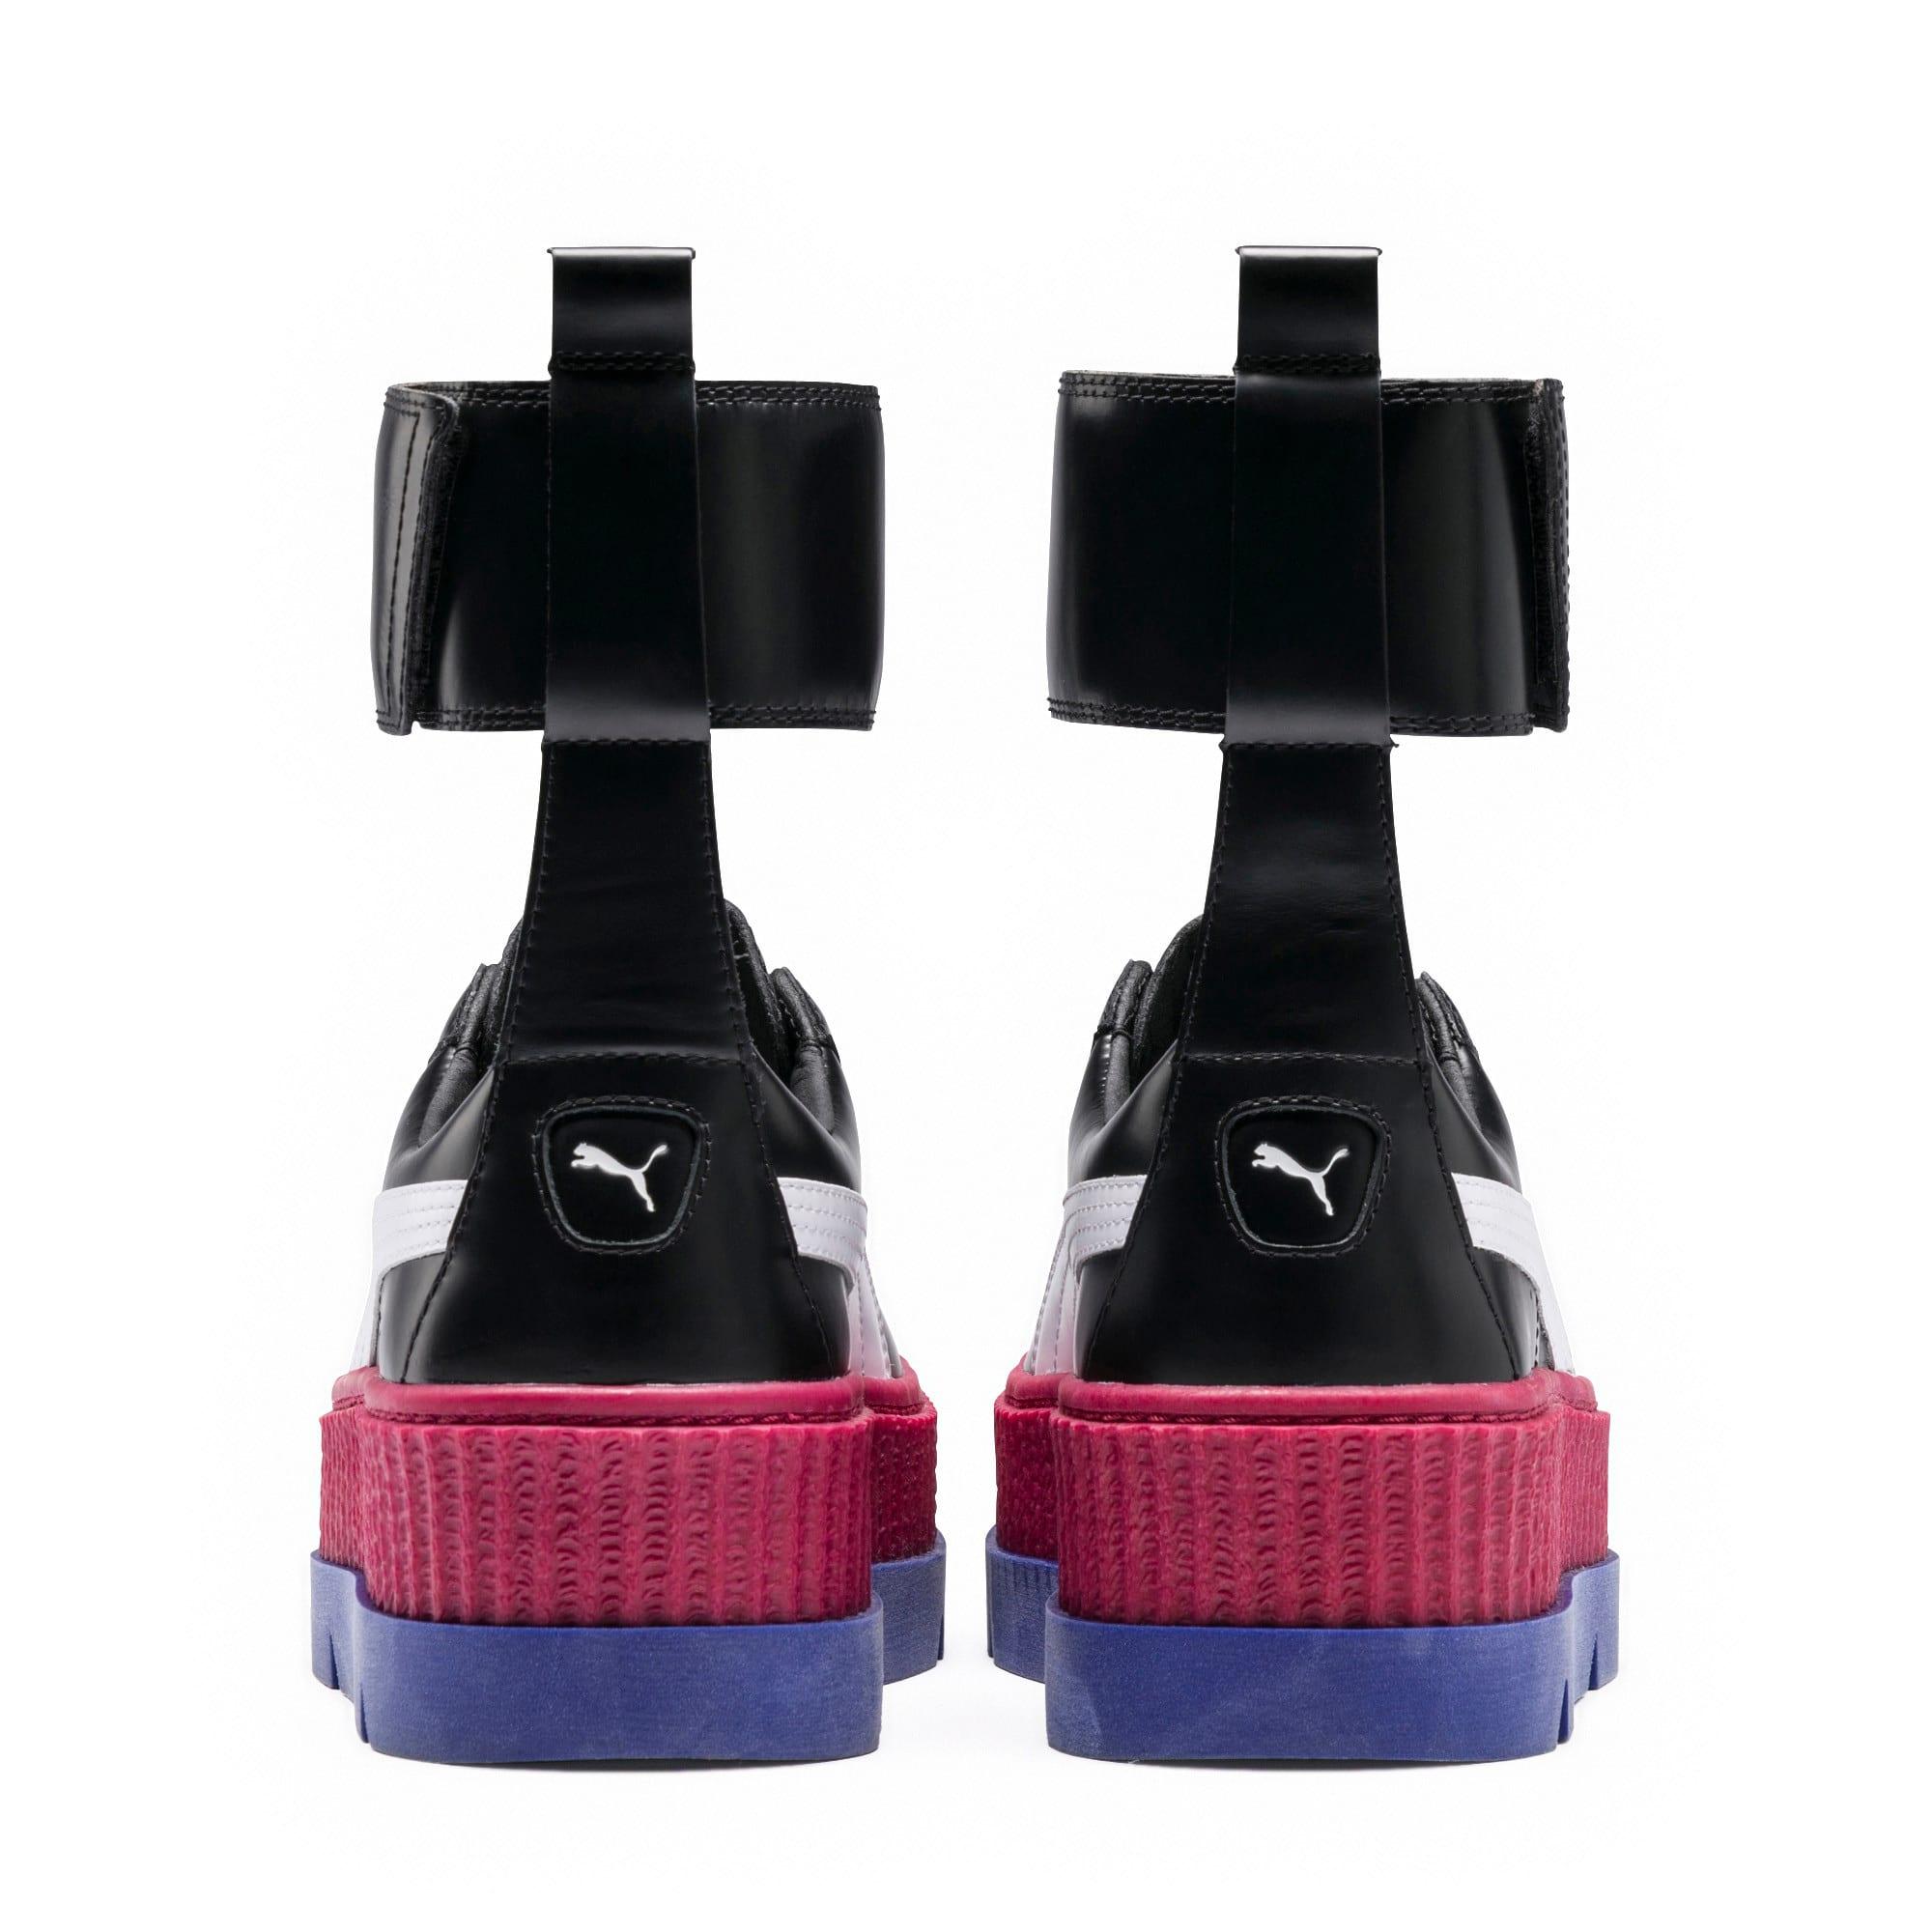 Thumbnail 4 of FENTY Women's Ankle Strap Trainer, Black-White-RedBud-Clematis, medium-IND